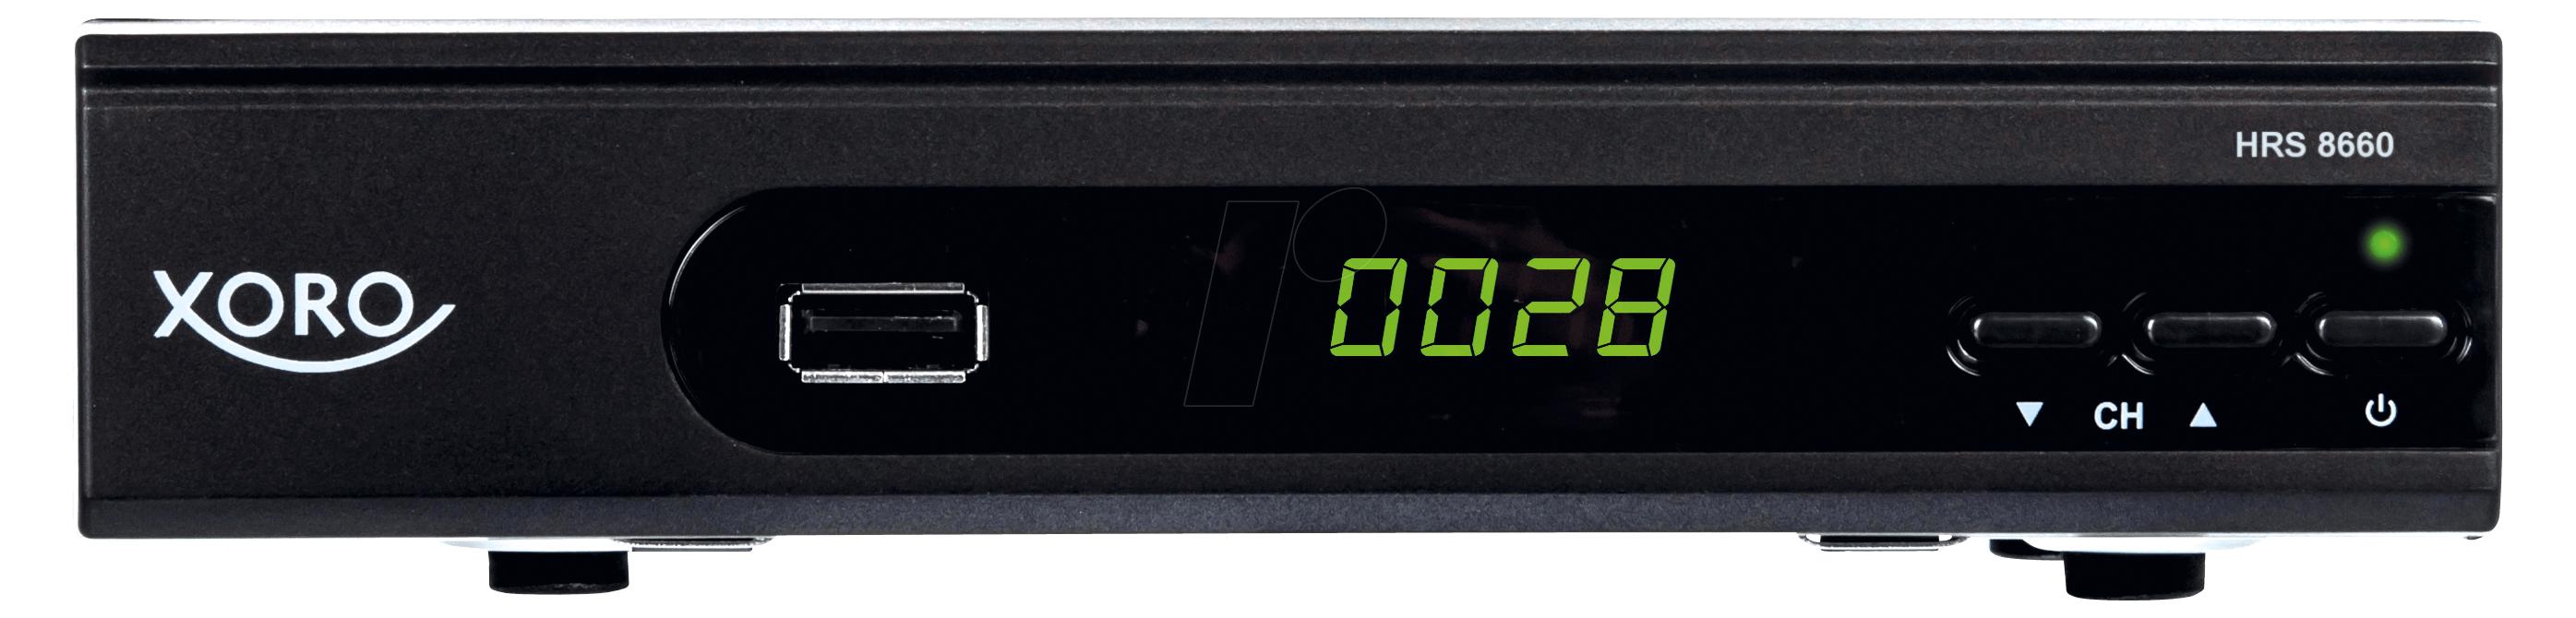 Xoro HRS 8660, HD DVB-S2 Receiver, PVR Ready, Black - SAT100489 Satelītu piederumi un aksesuāri